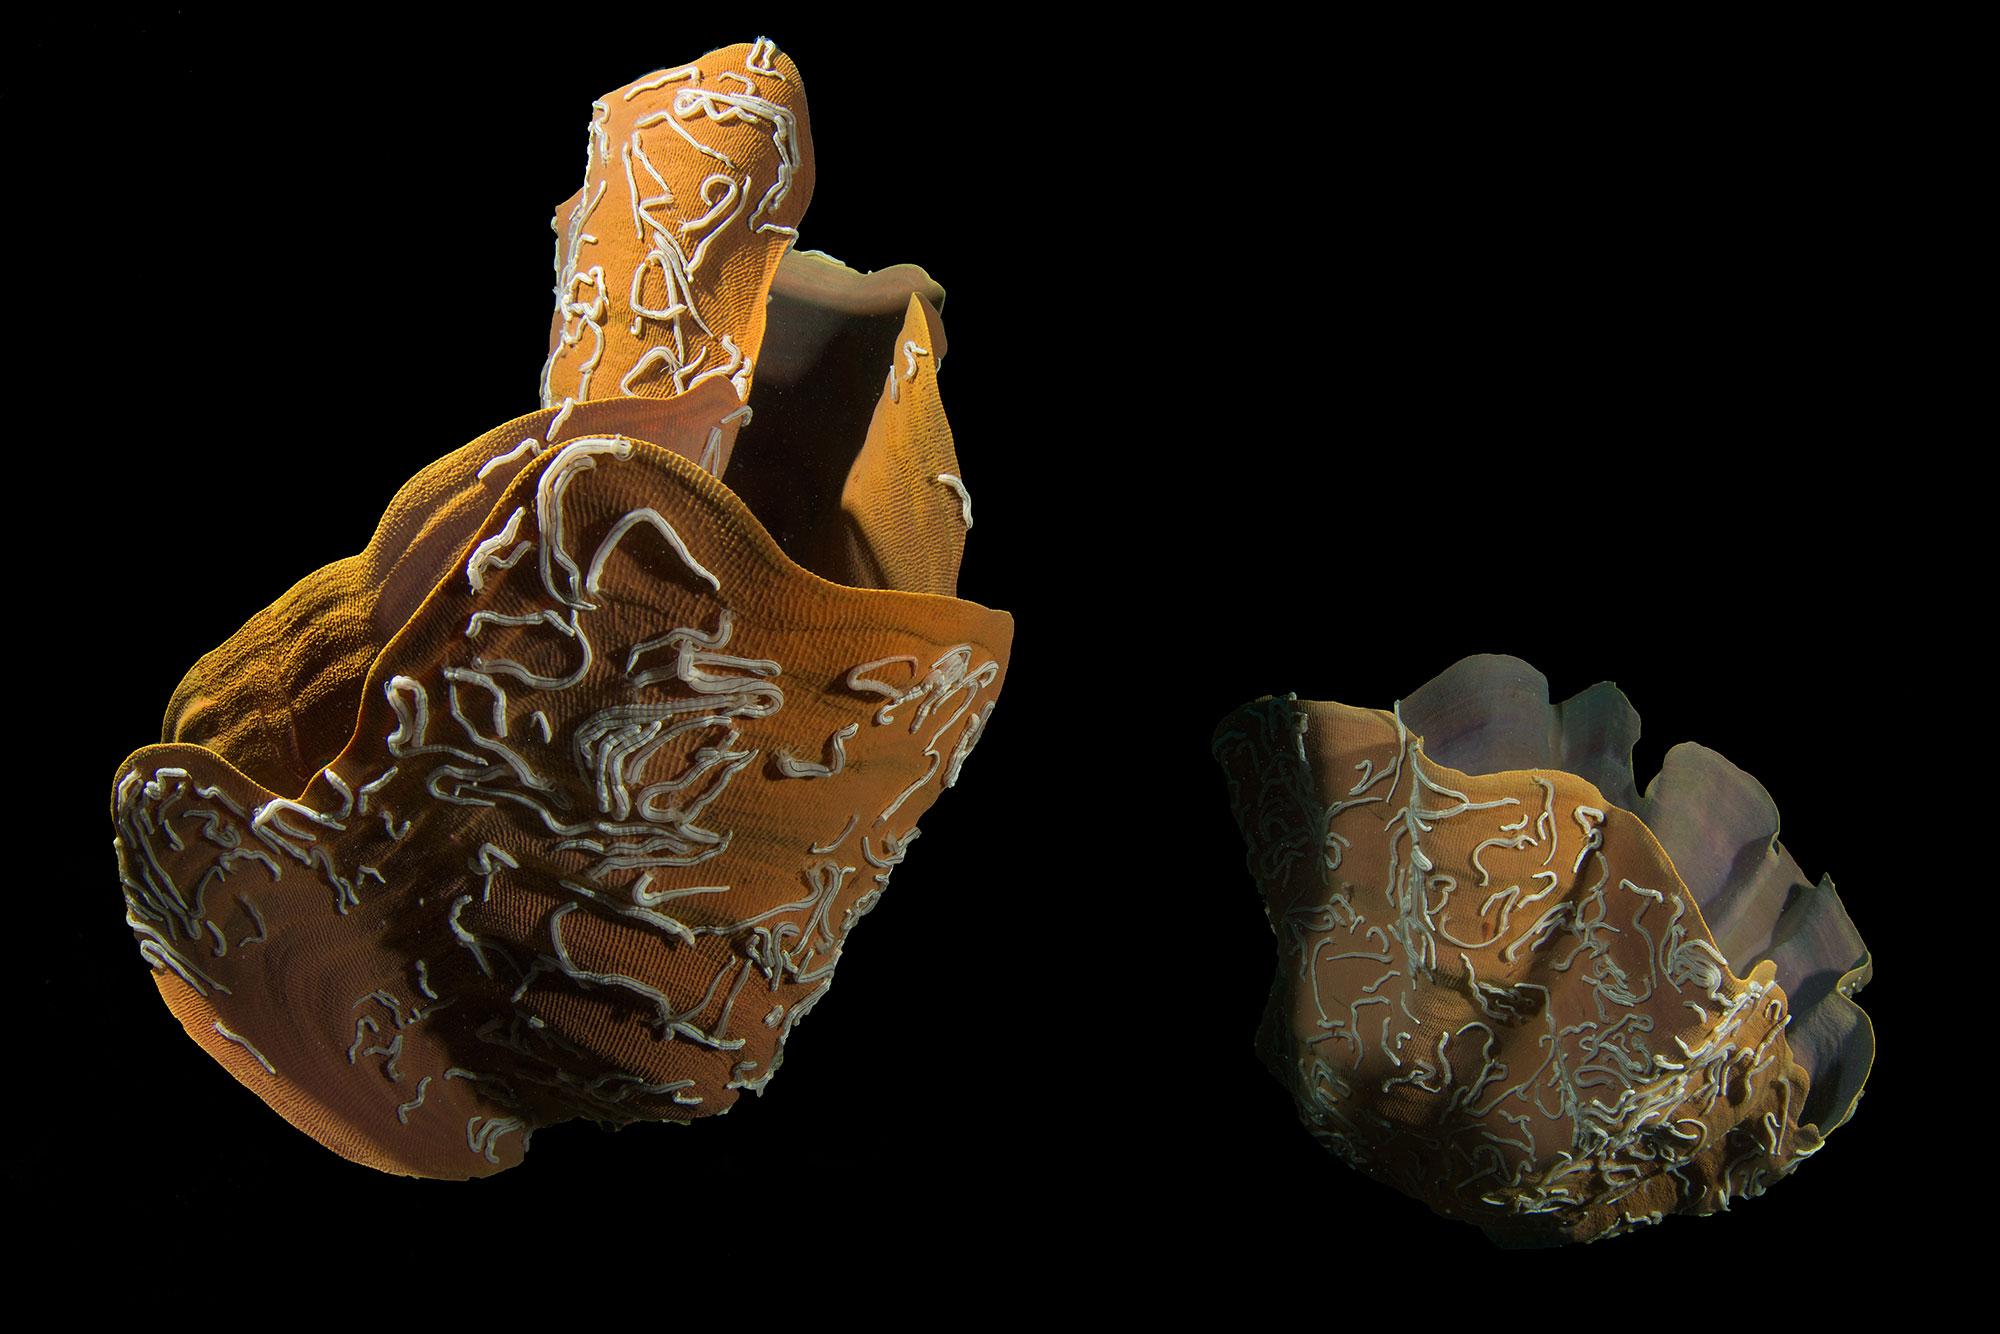 Raja Ampat Sponge Formations, Schwamm Formationen